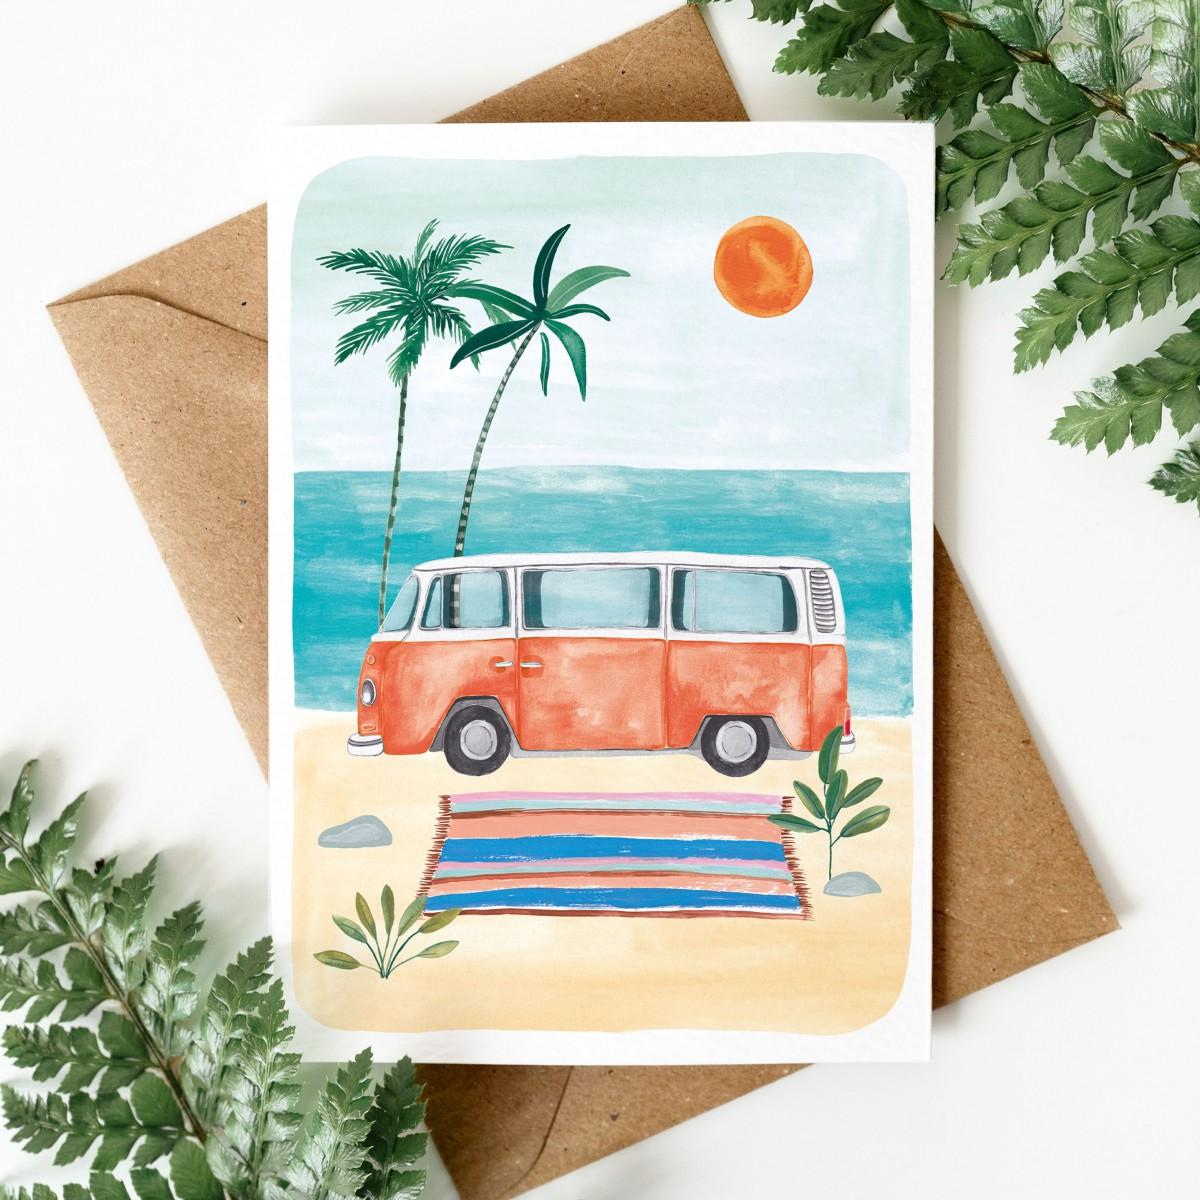 Paperlandscape | Faltkarte | VW Bulli Strand | Urlaubskarte | Ferien mit Camper